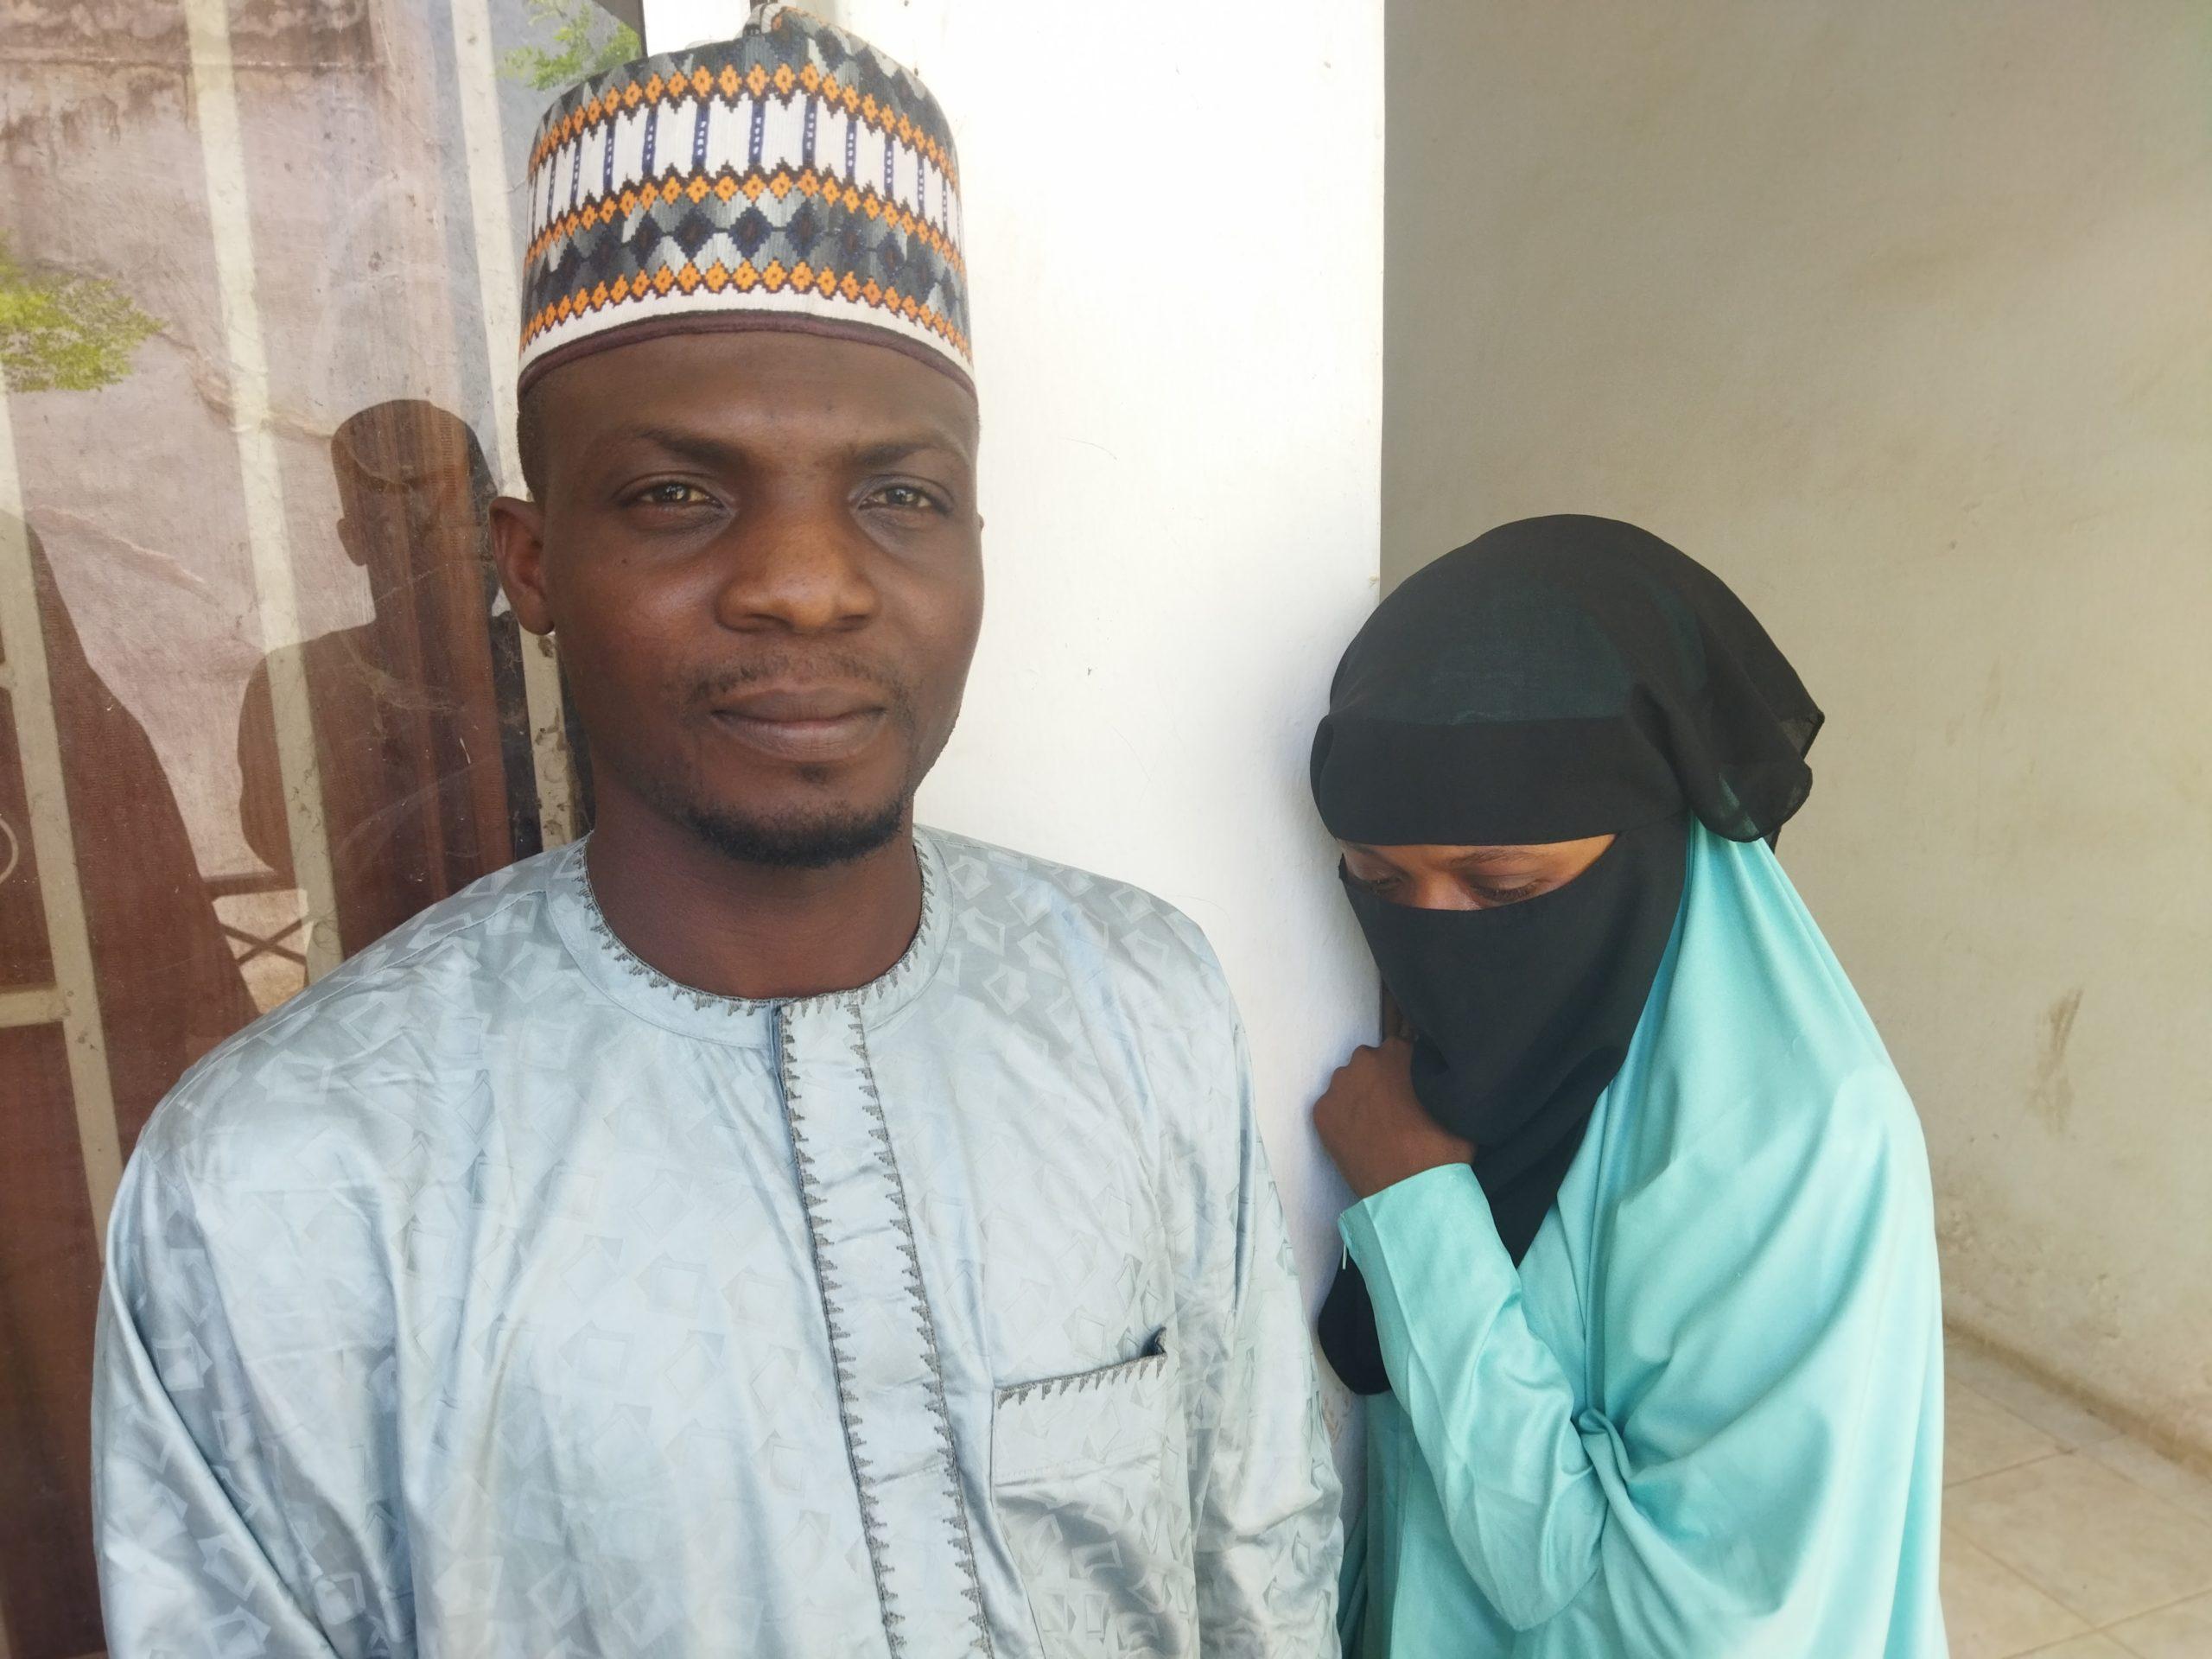 Abubakar Yusuf and his bride Hafsat Abdullahi